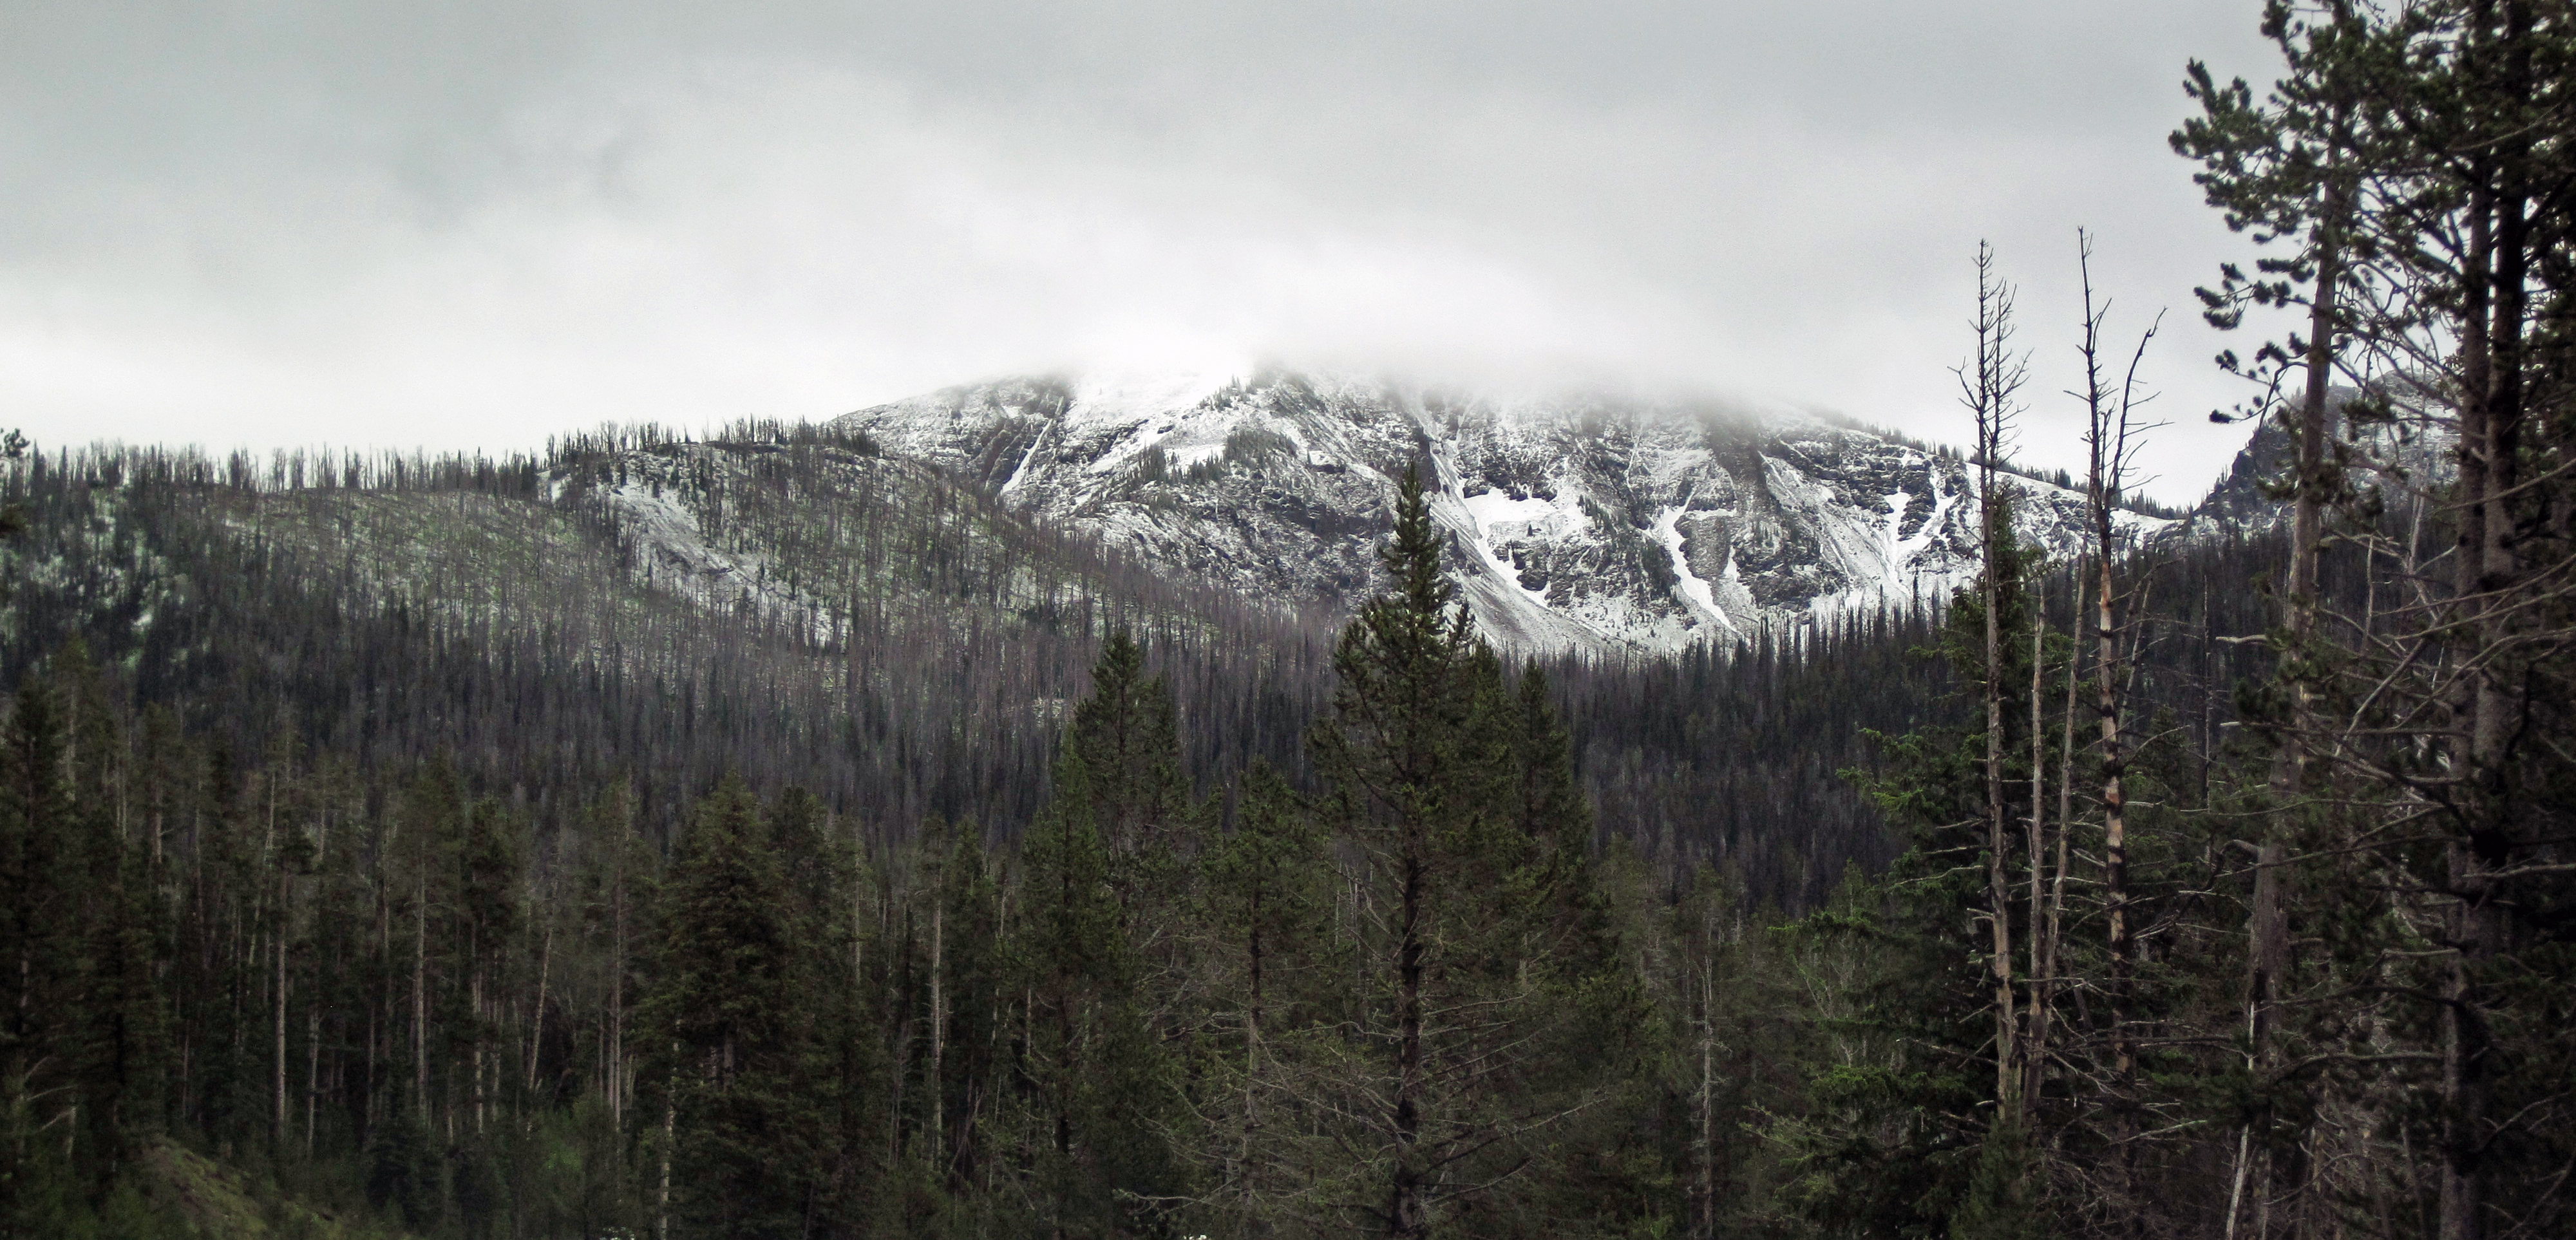 Freshly-fallen_snow_in_the_Absaroka_Range_%2811_July_2016%29_%28near_Sylvan_Pass%2C_Yellowstone%2C_Wyoming%2C_USA%29_2_%2827845376773%29.jpg